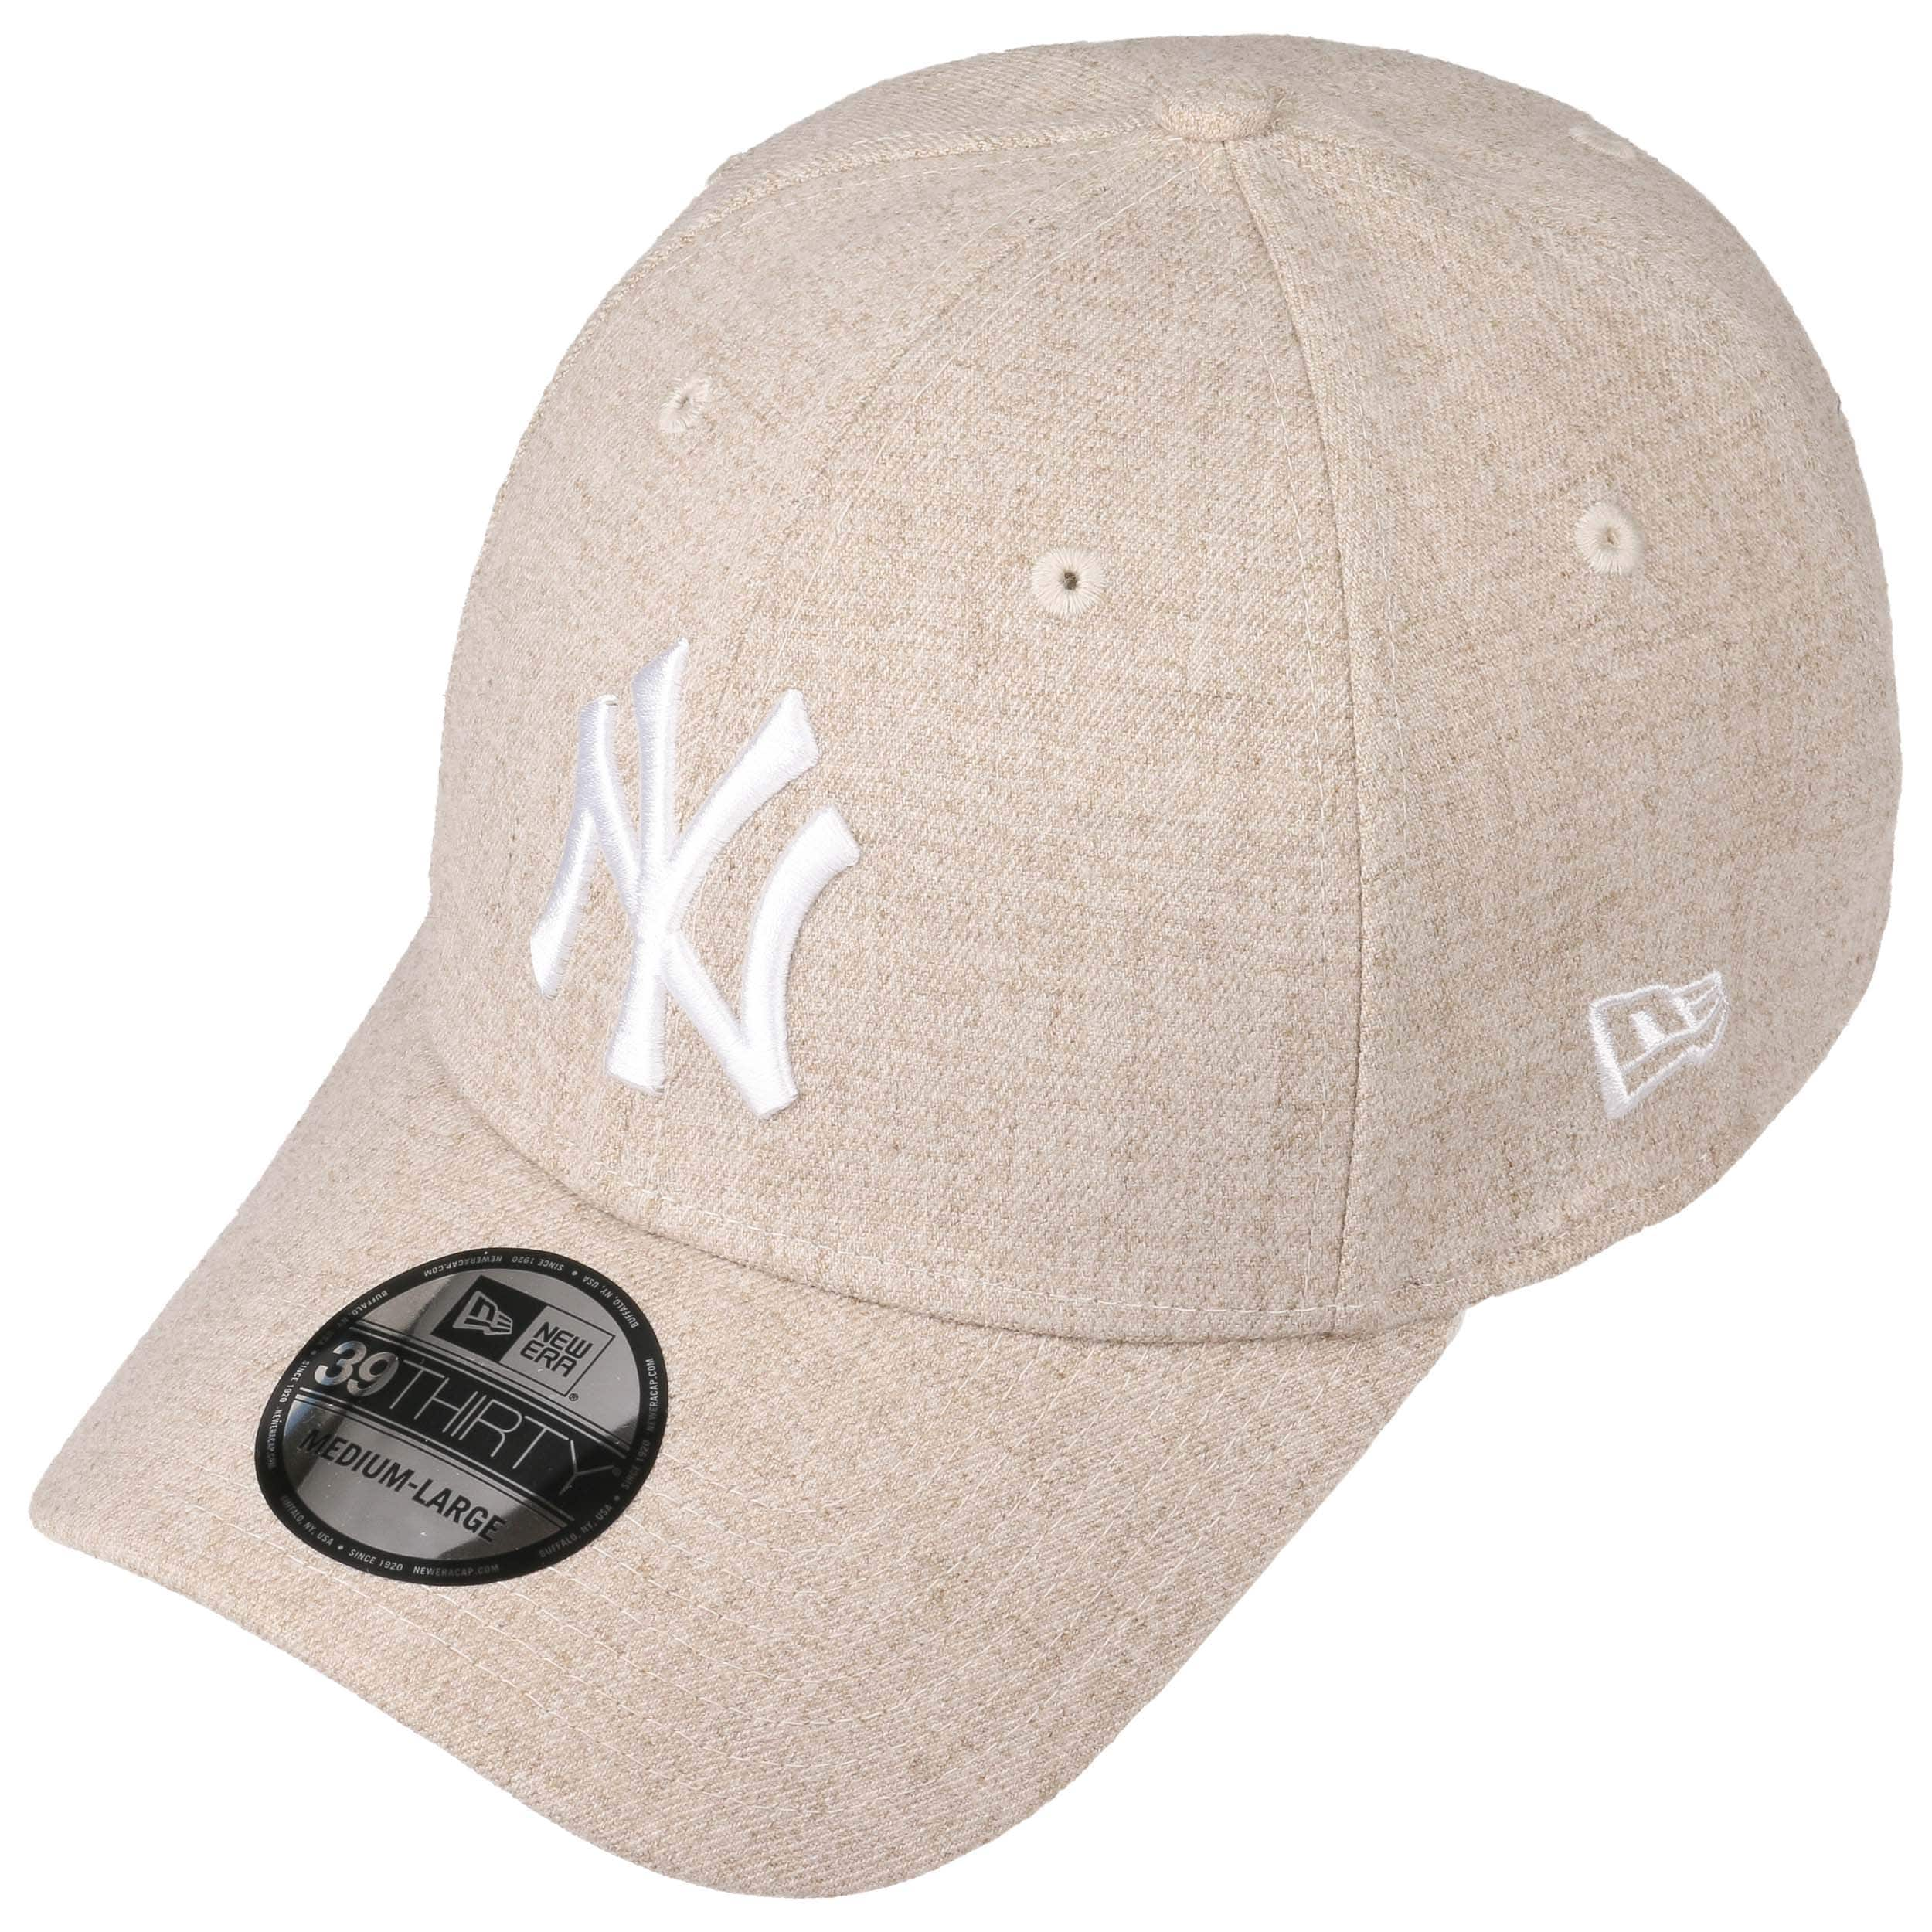 22eda24c530d 39Thirty Yankees Heather Cap by New Era - beige 1 ...